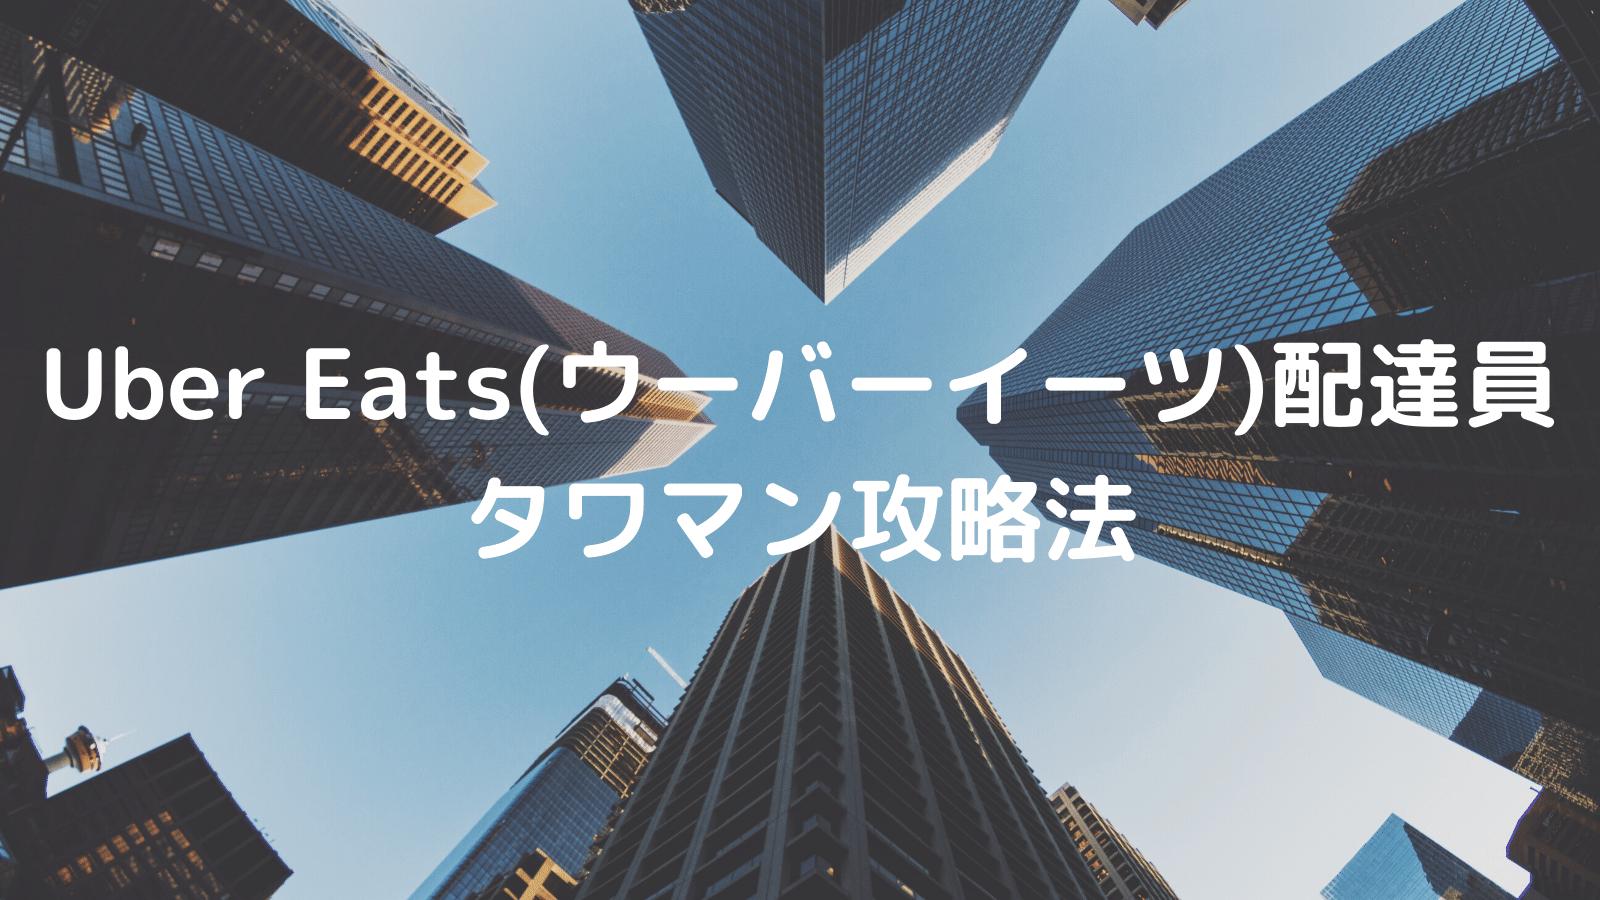 Uber Eats(ウーバーイーツ)配達員タワマン攻略法!